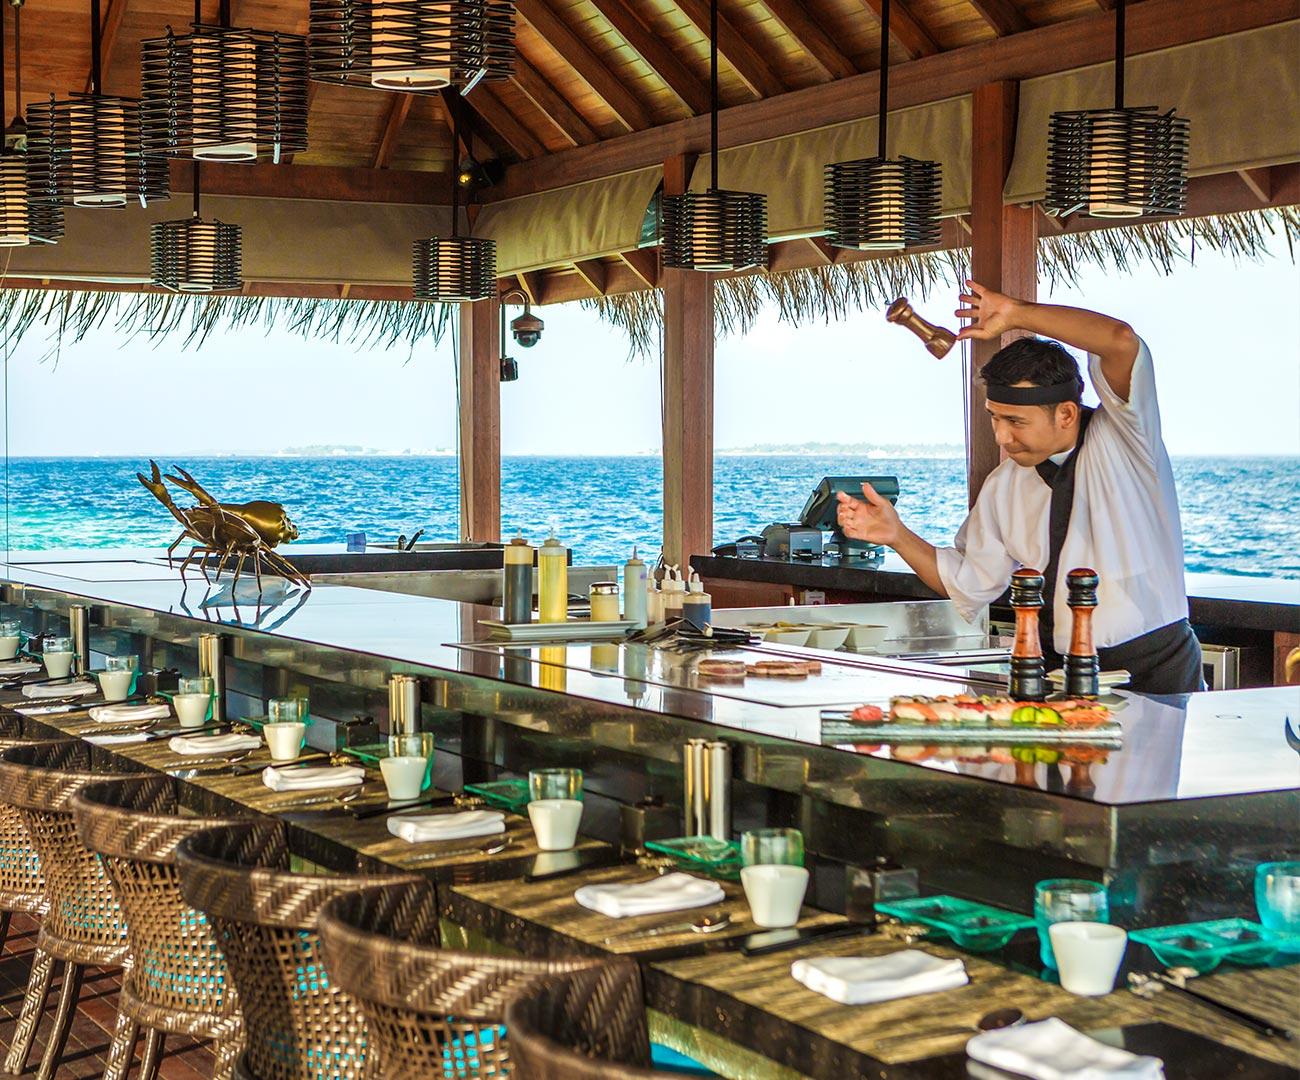 Kurumba Maldives - Japanese Restaurant Image - Maldives Resort